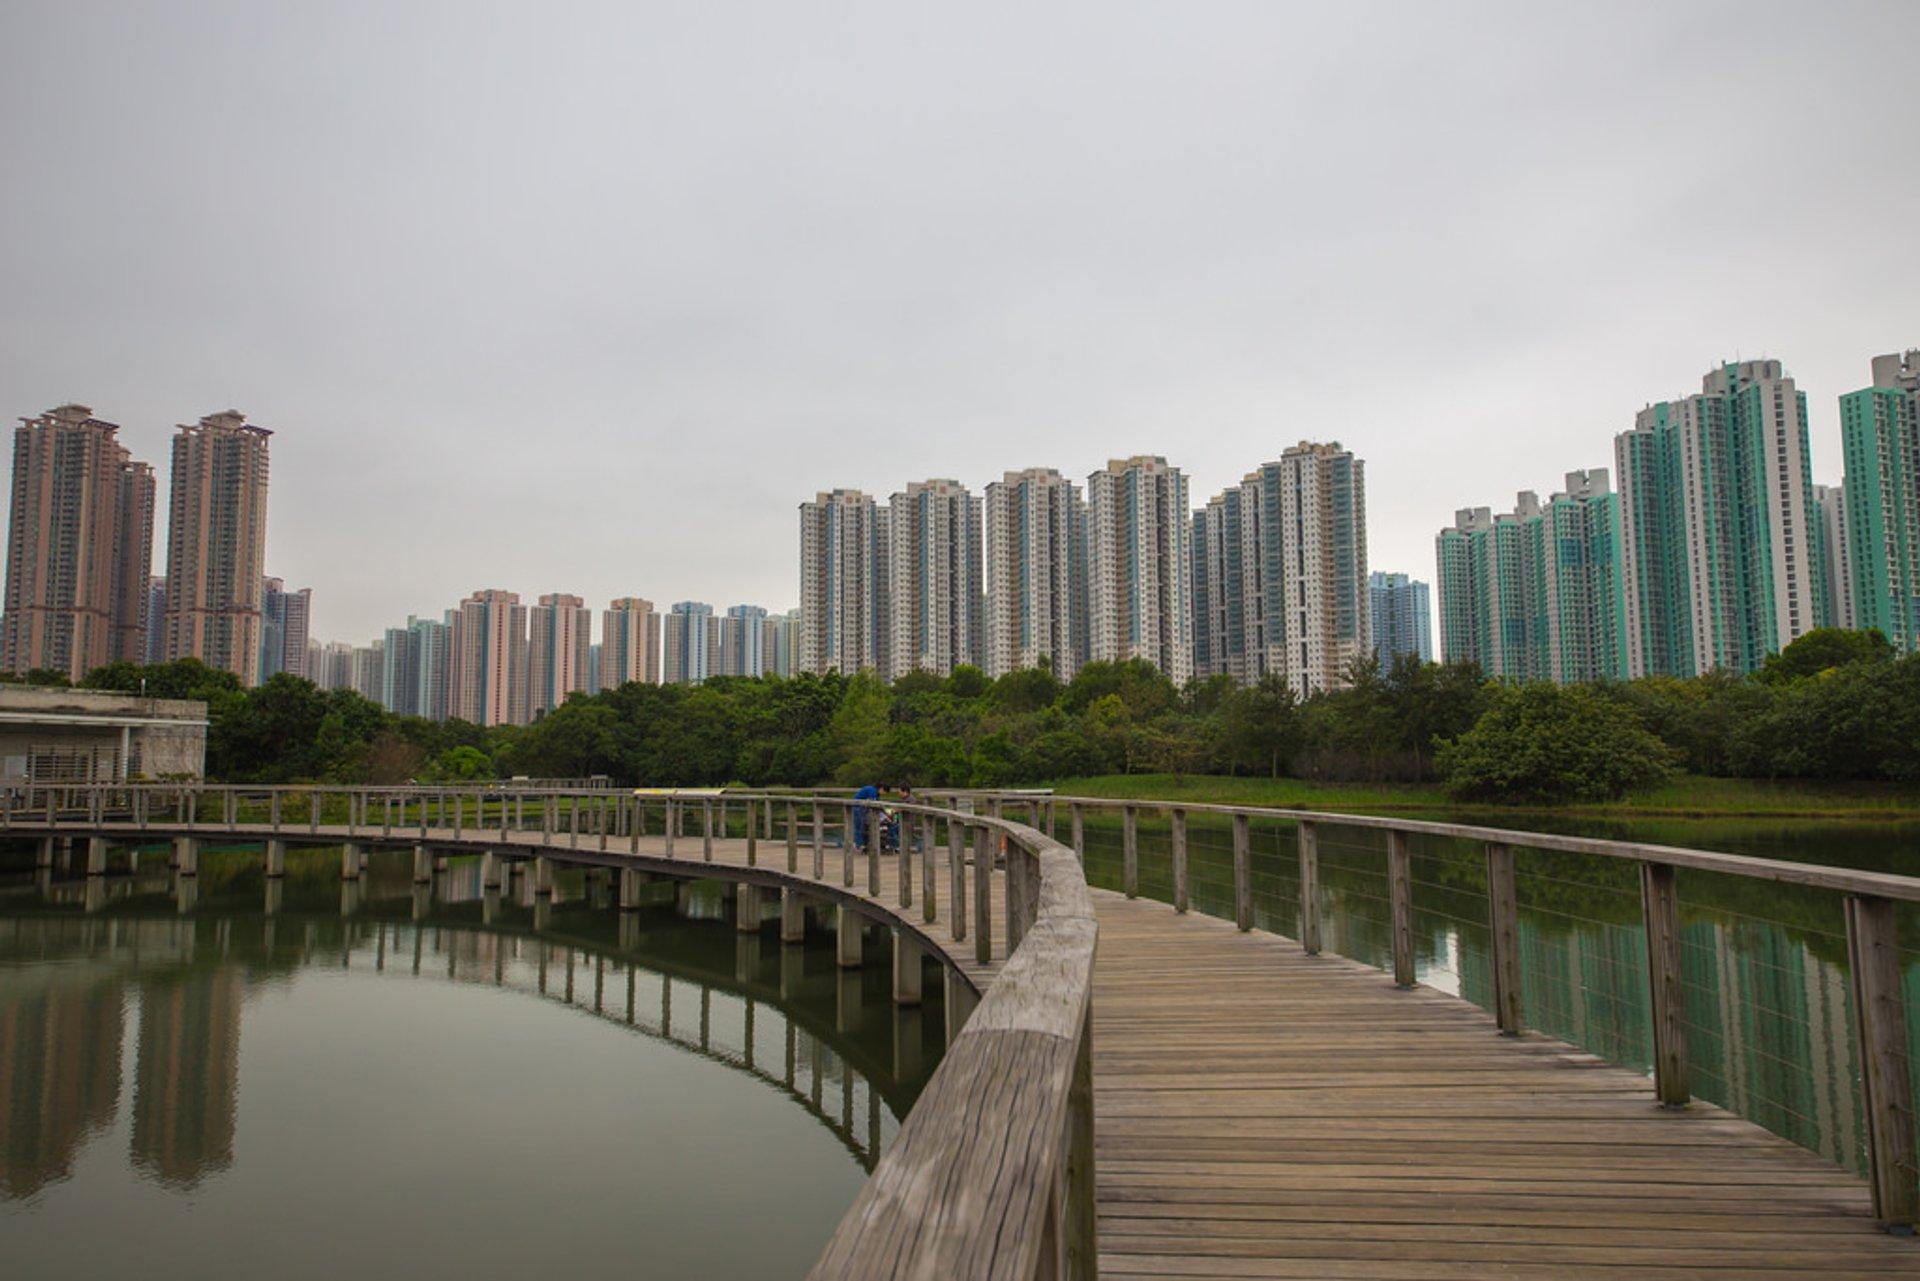 Migratory Birds at Hong Kong Wetland Park in Hong Kong 2020 - Best Time